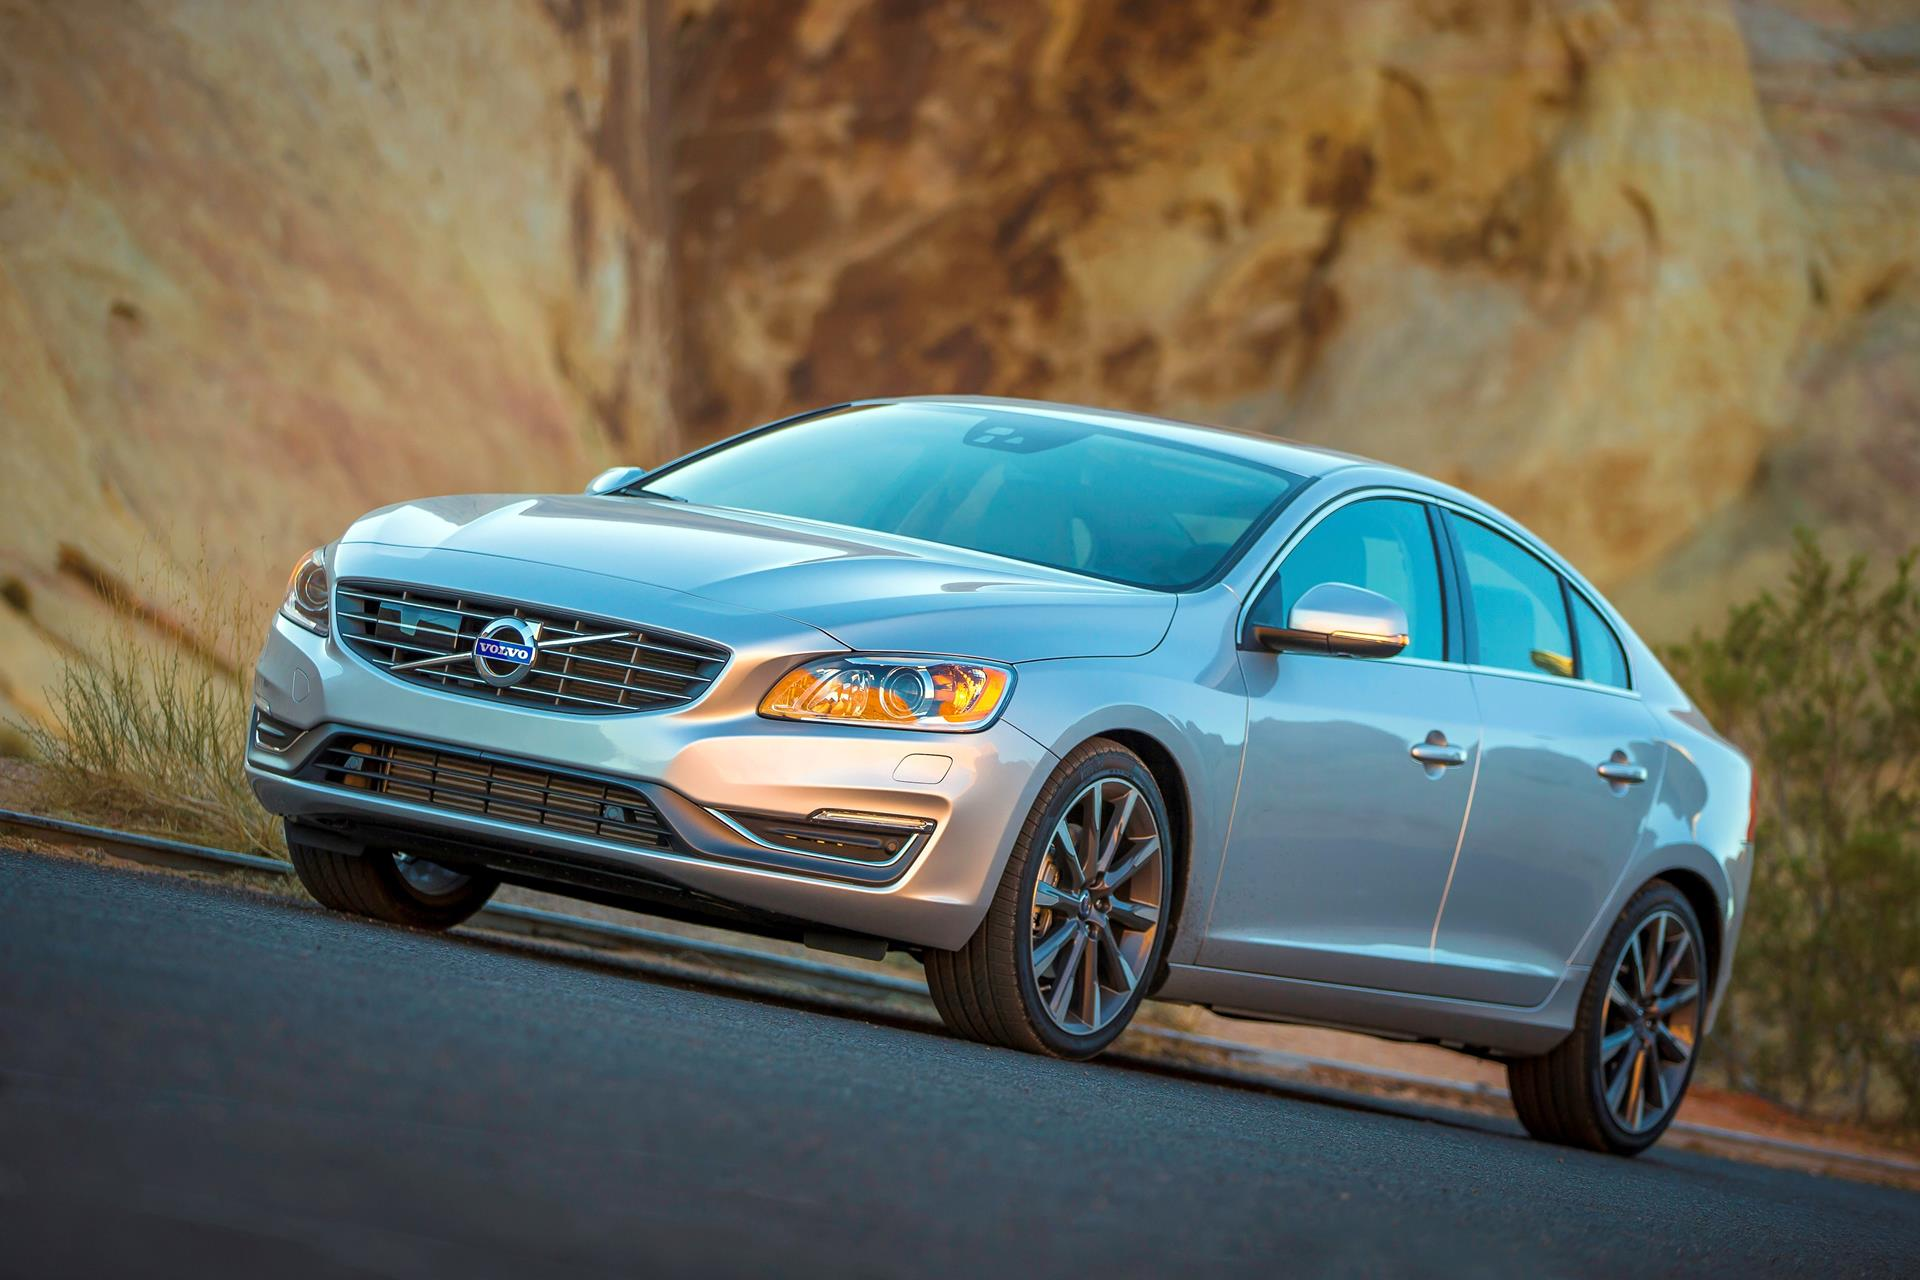 2015 Volvo S60 Conceptcarz Com